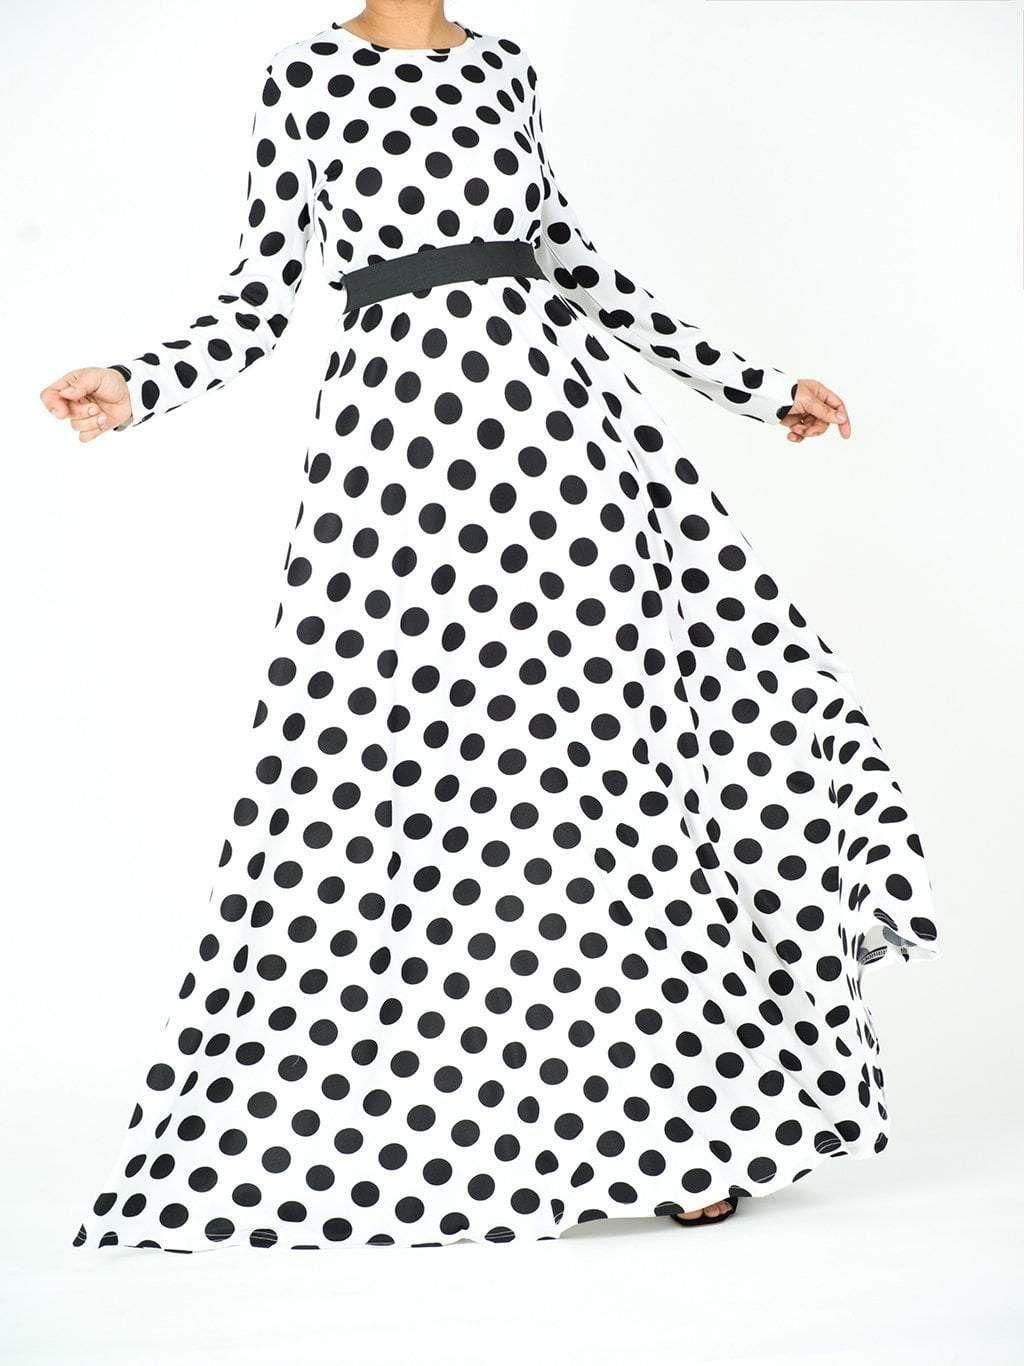 Long Sleeve Polka Dots Maxi Dress In 2021 Polka Dot Maxi Dresses Modest Maxi Dress White And Black Polka Dot Dress [ 1366 x 1024 Pixel ]